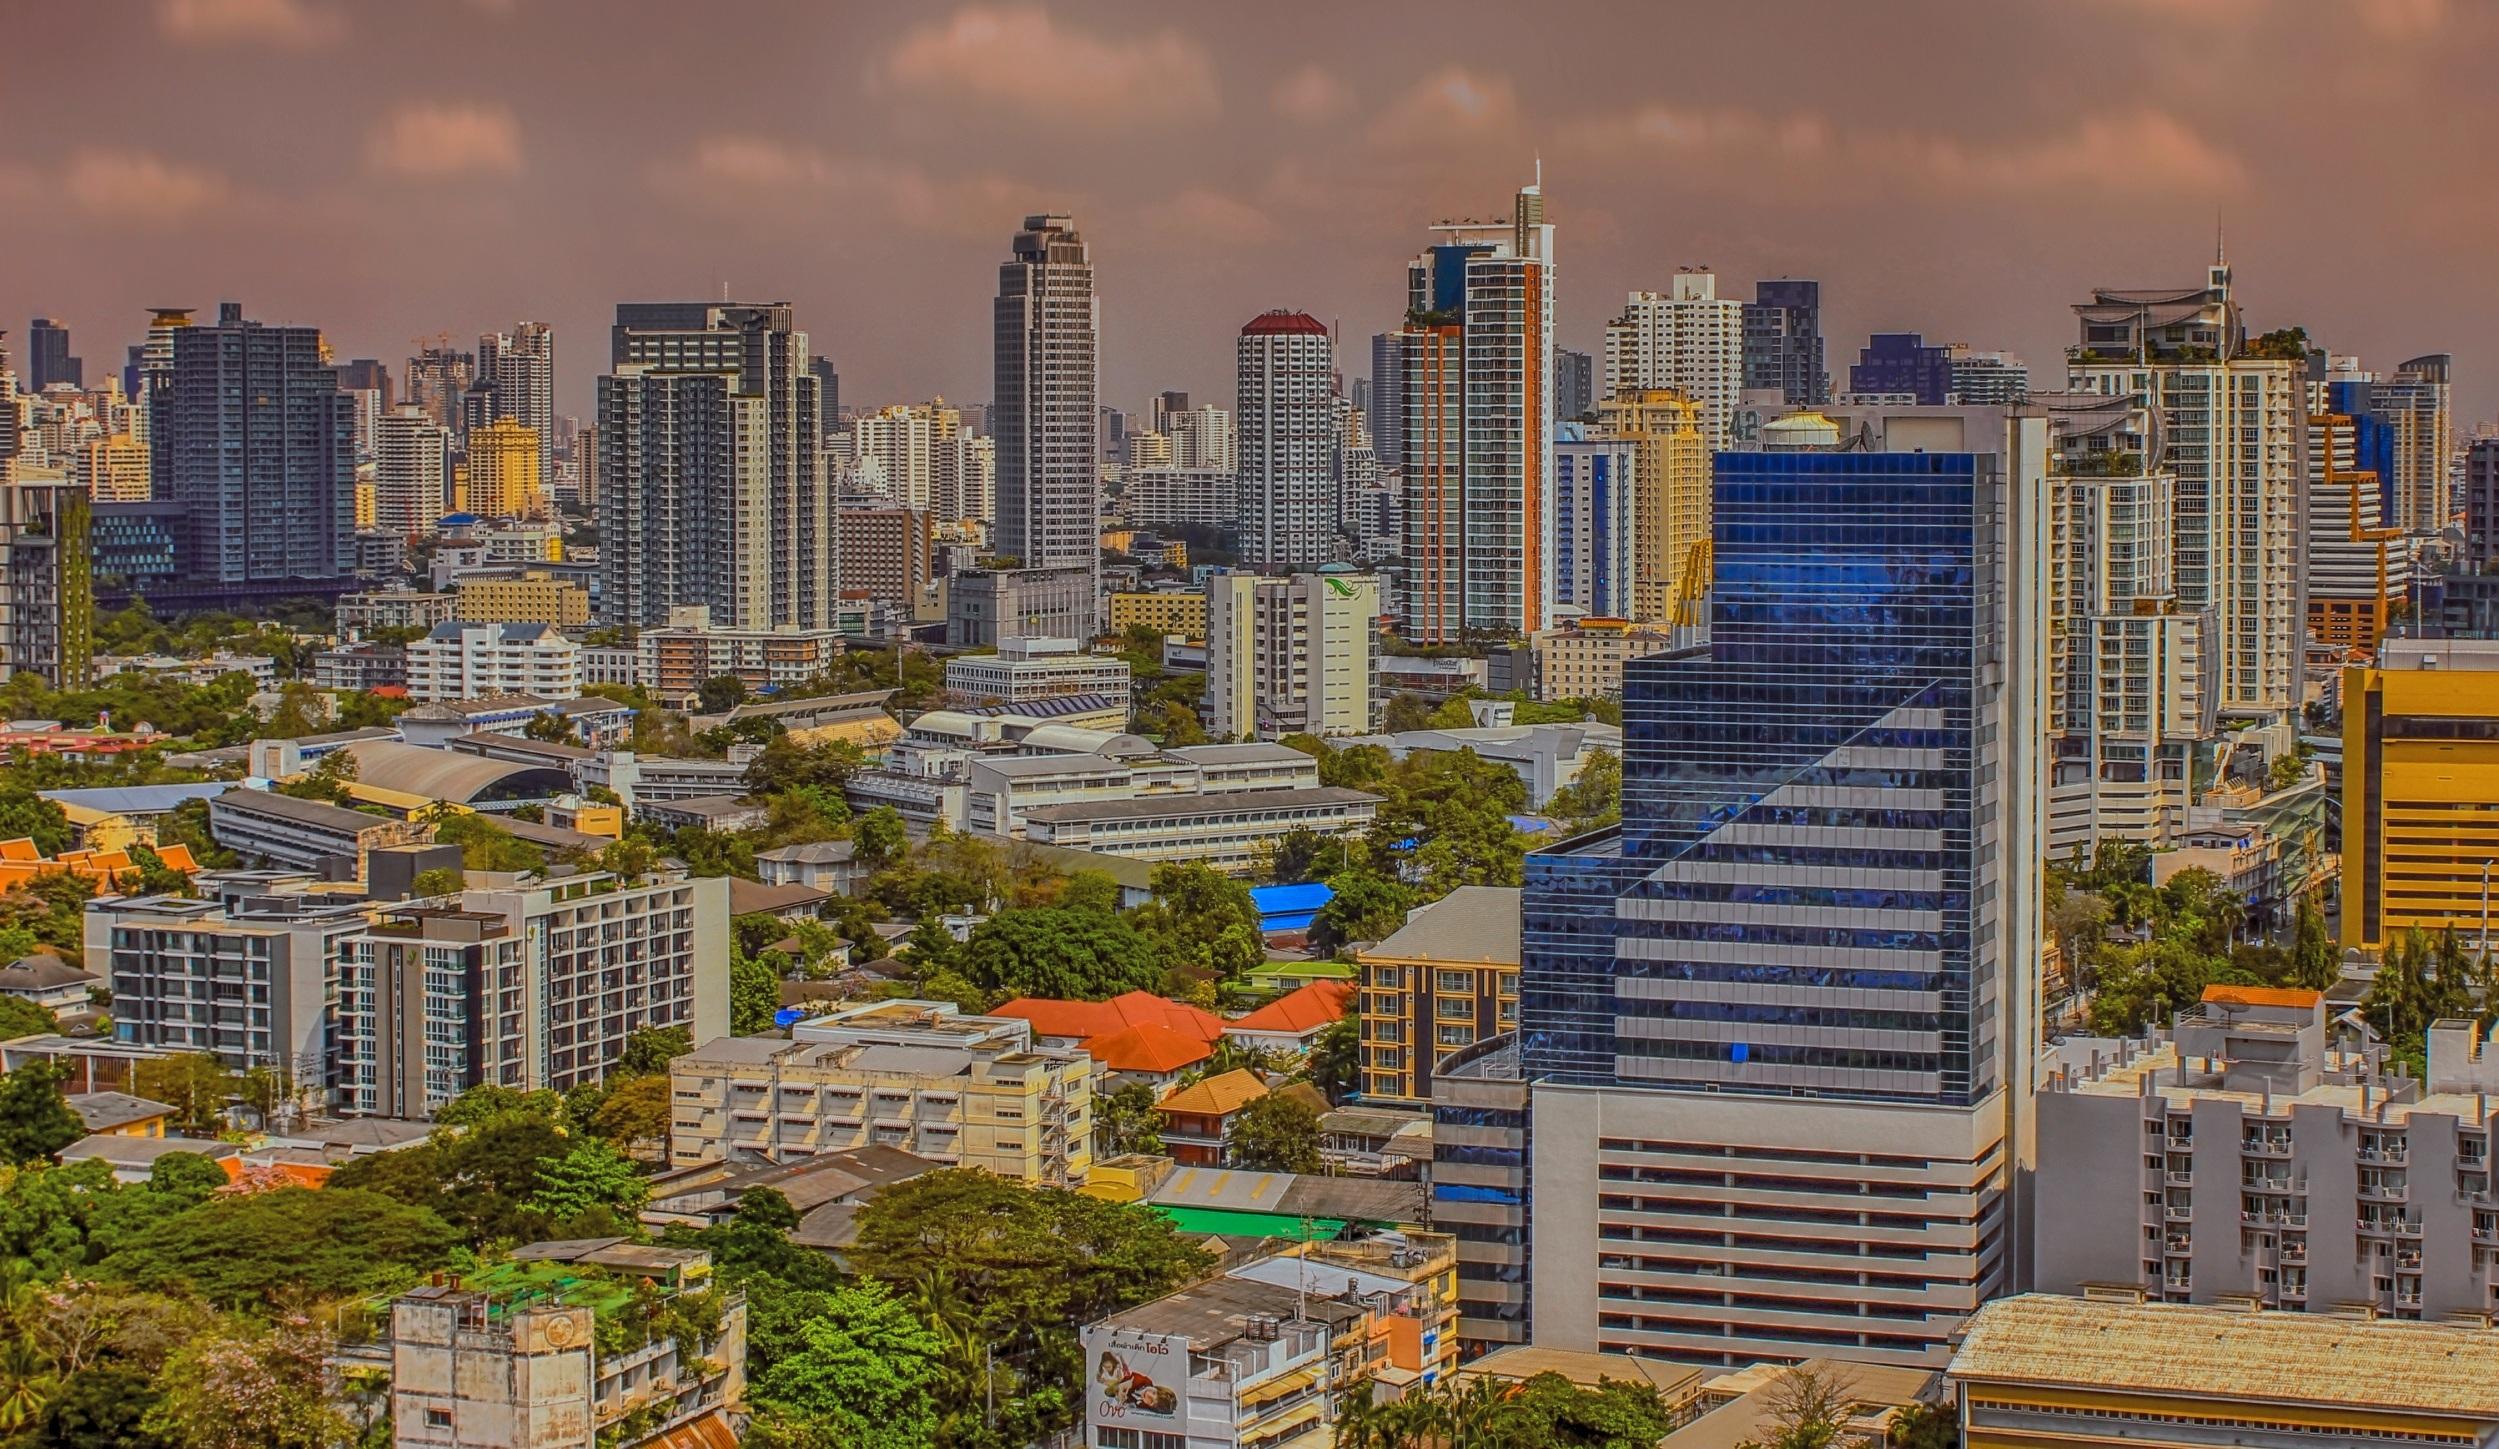 Bangkok pre-flood